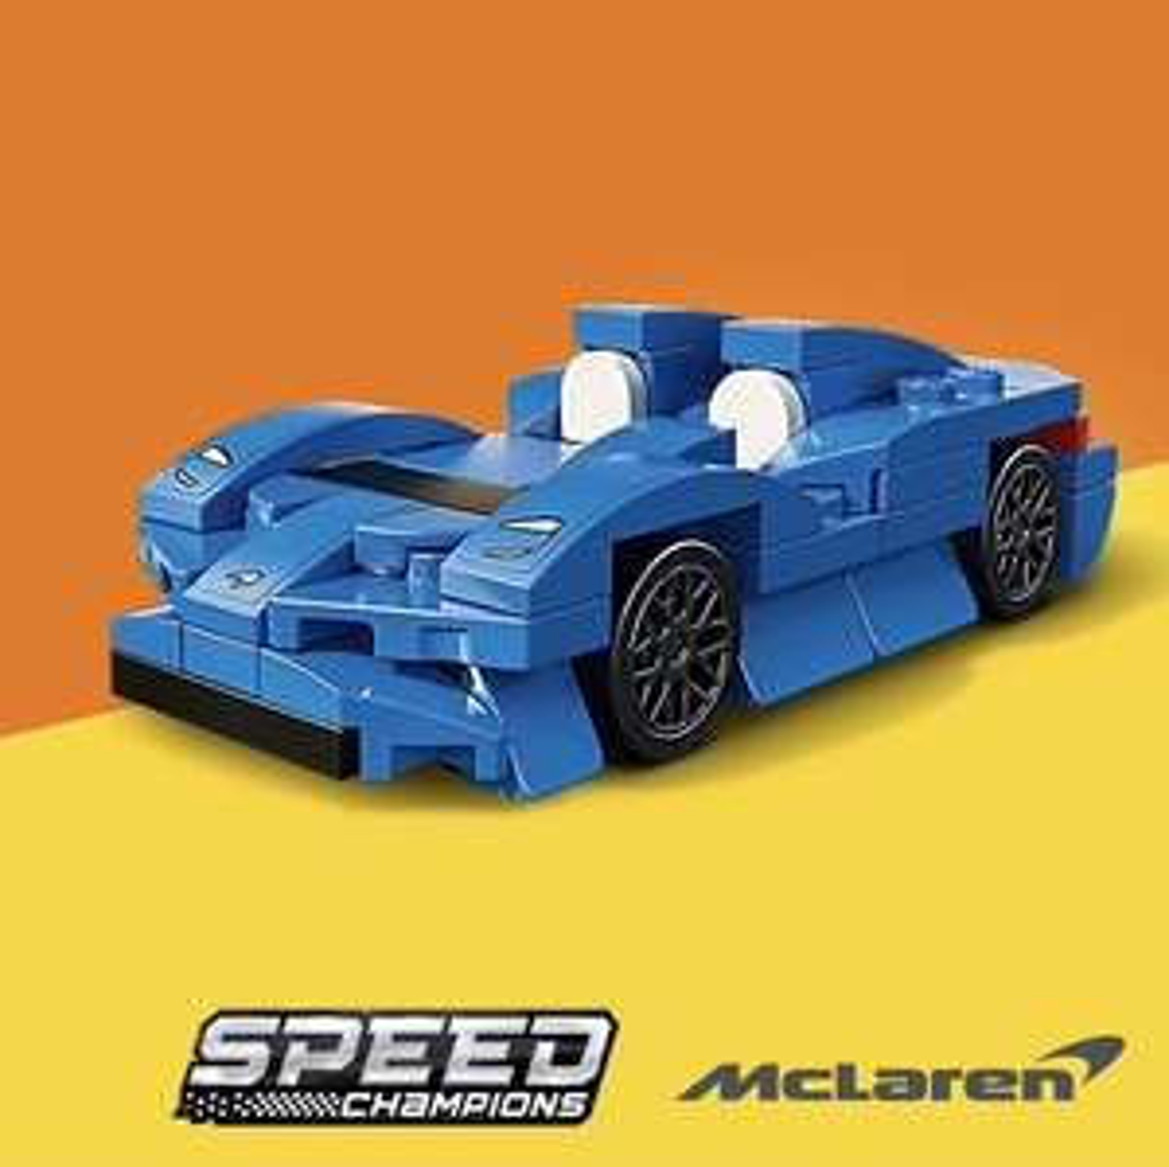 Jeu de Construction Lego McLaren Elva (30343) offert des 40€ d'achat - Hors Exceptions